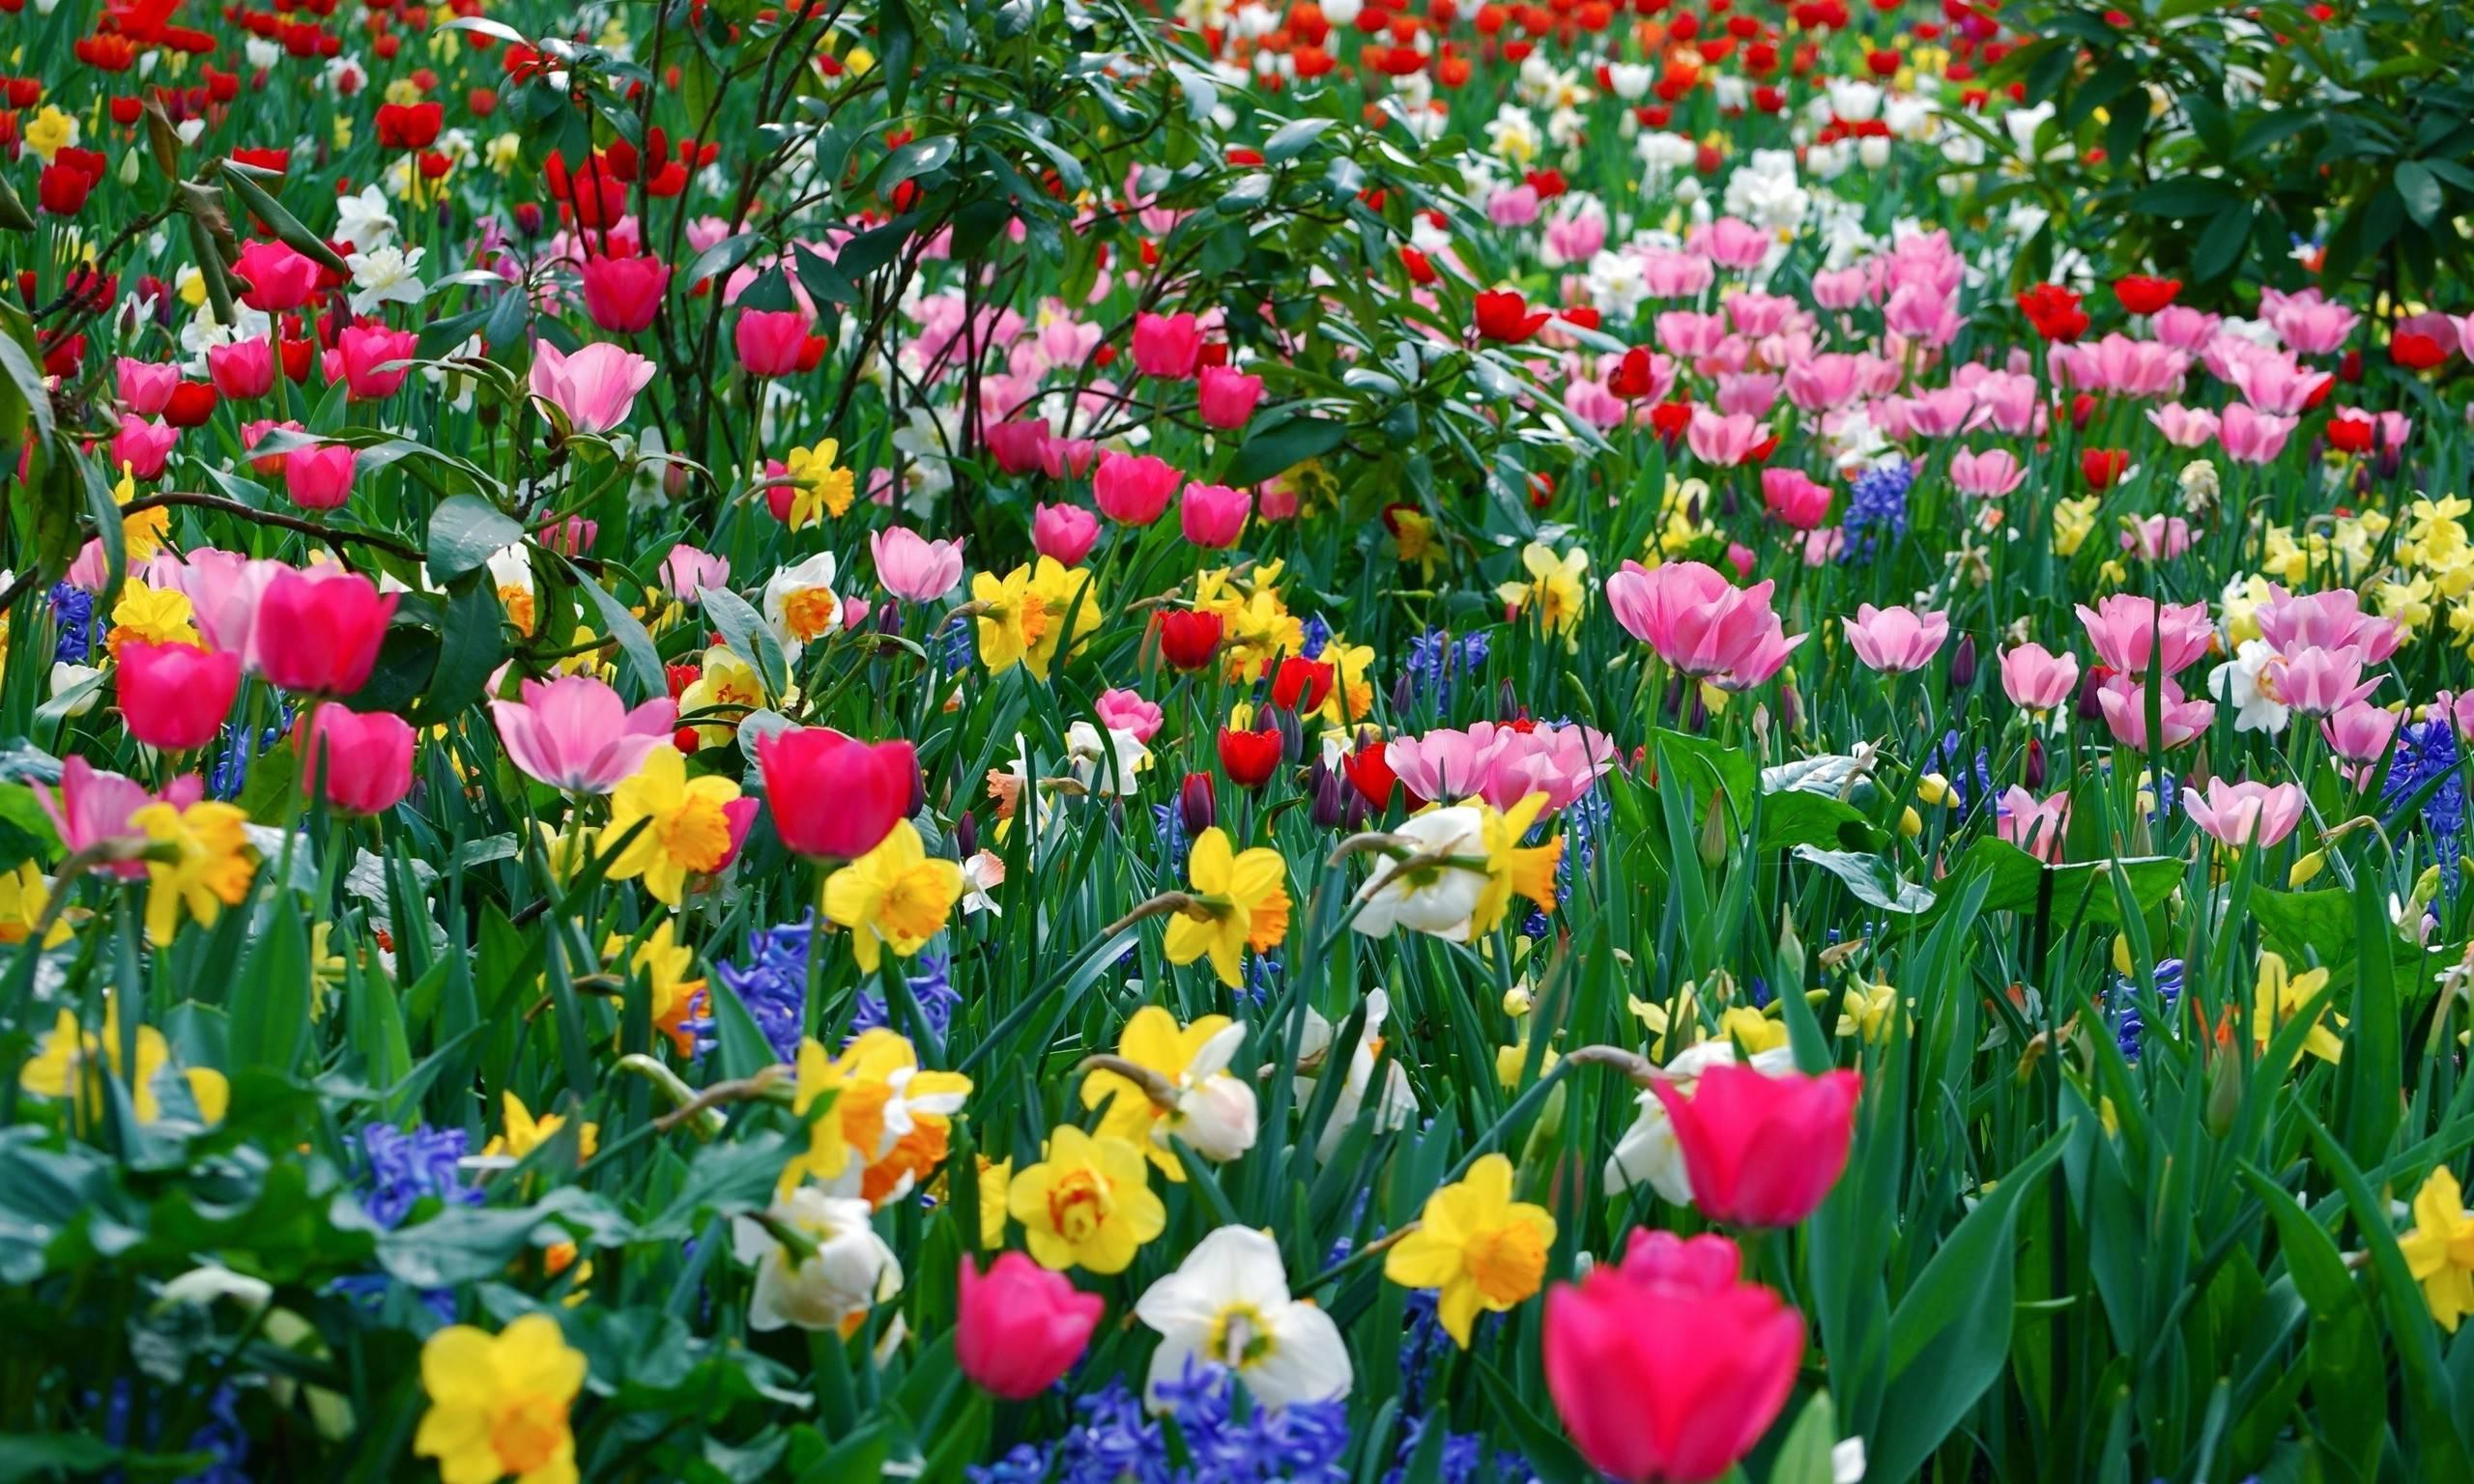 Spring Flower Wallpaper Backgrounds 2560x1536